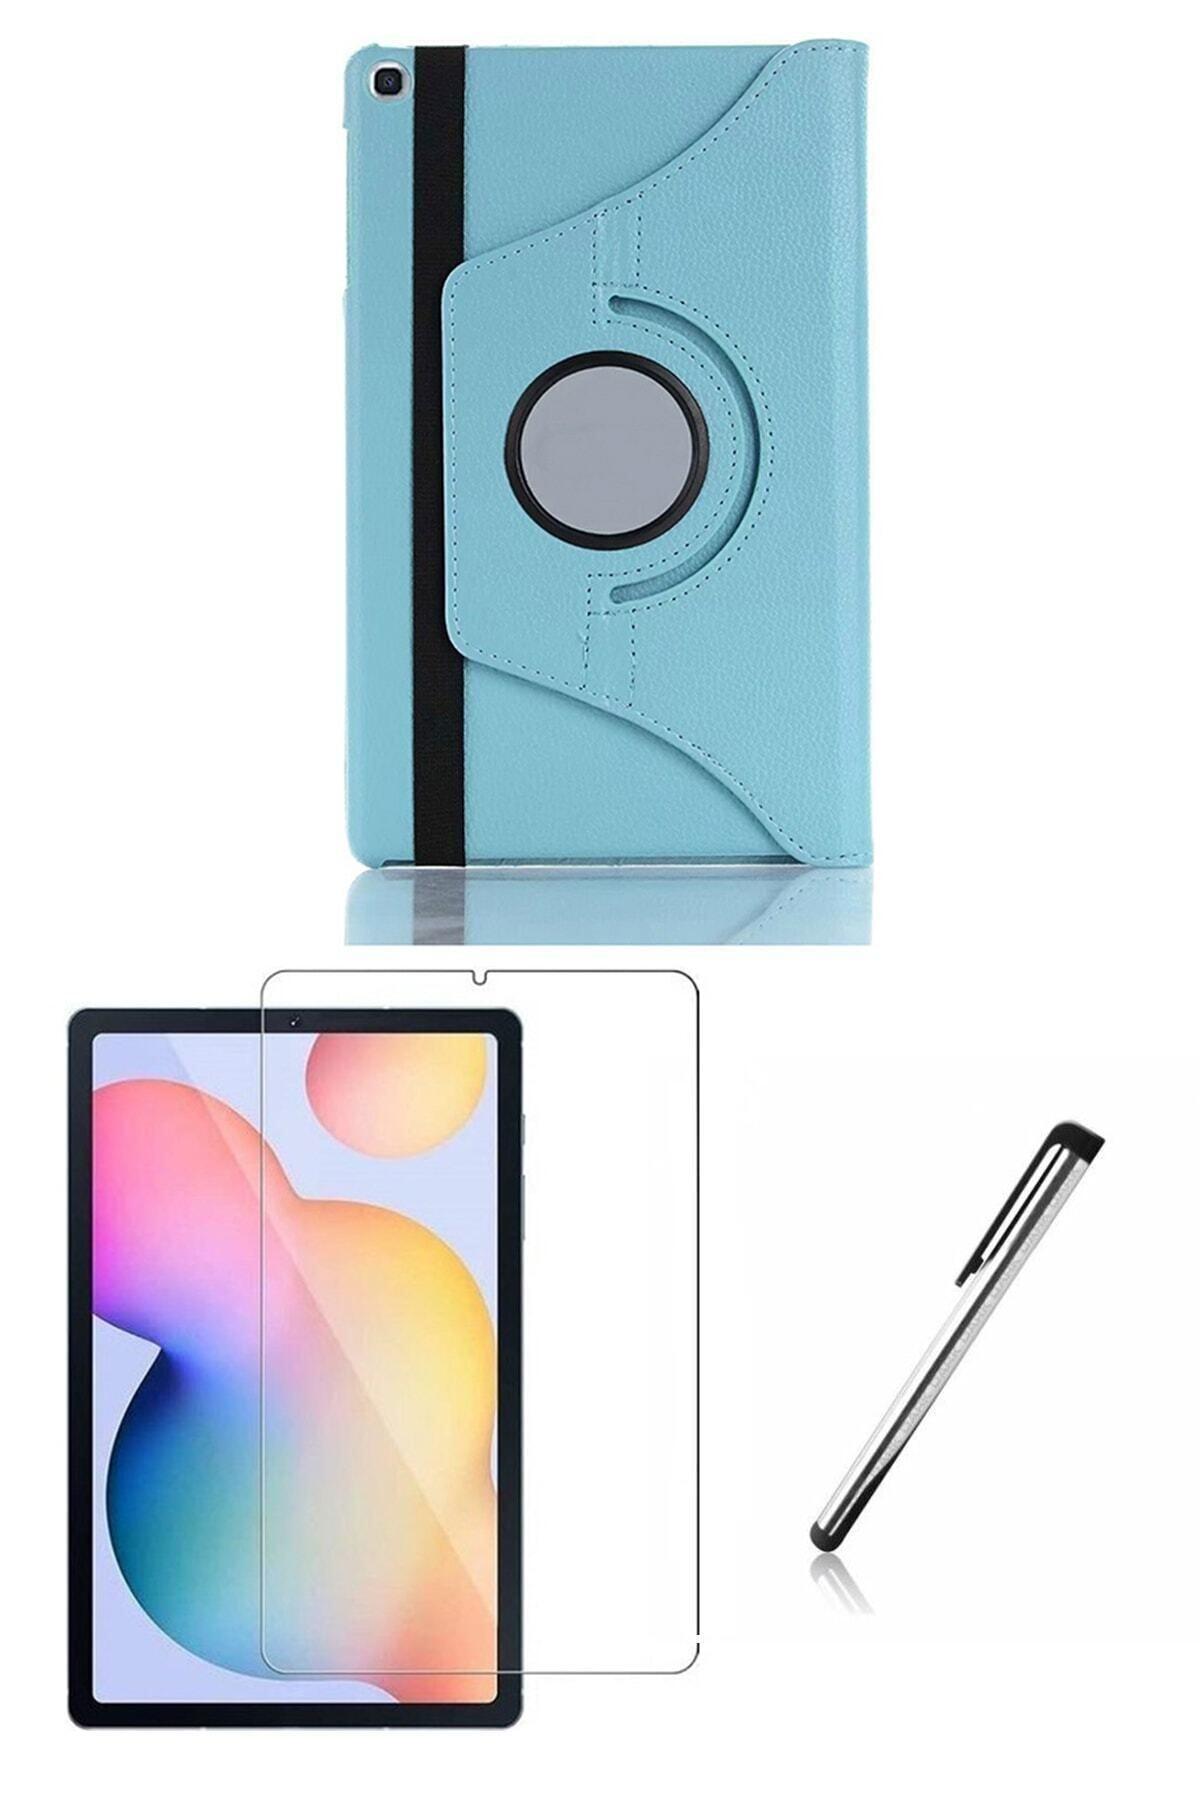 Esepetim Samsung Galaxy Tab S6 Lite P610 Turkuaz Dönerli Tablet Kılıf Seti (10.4 Inç) 1